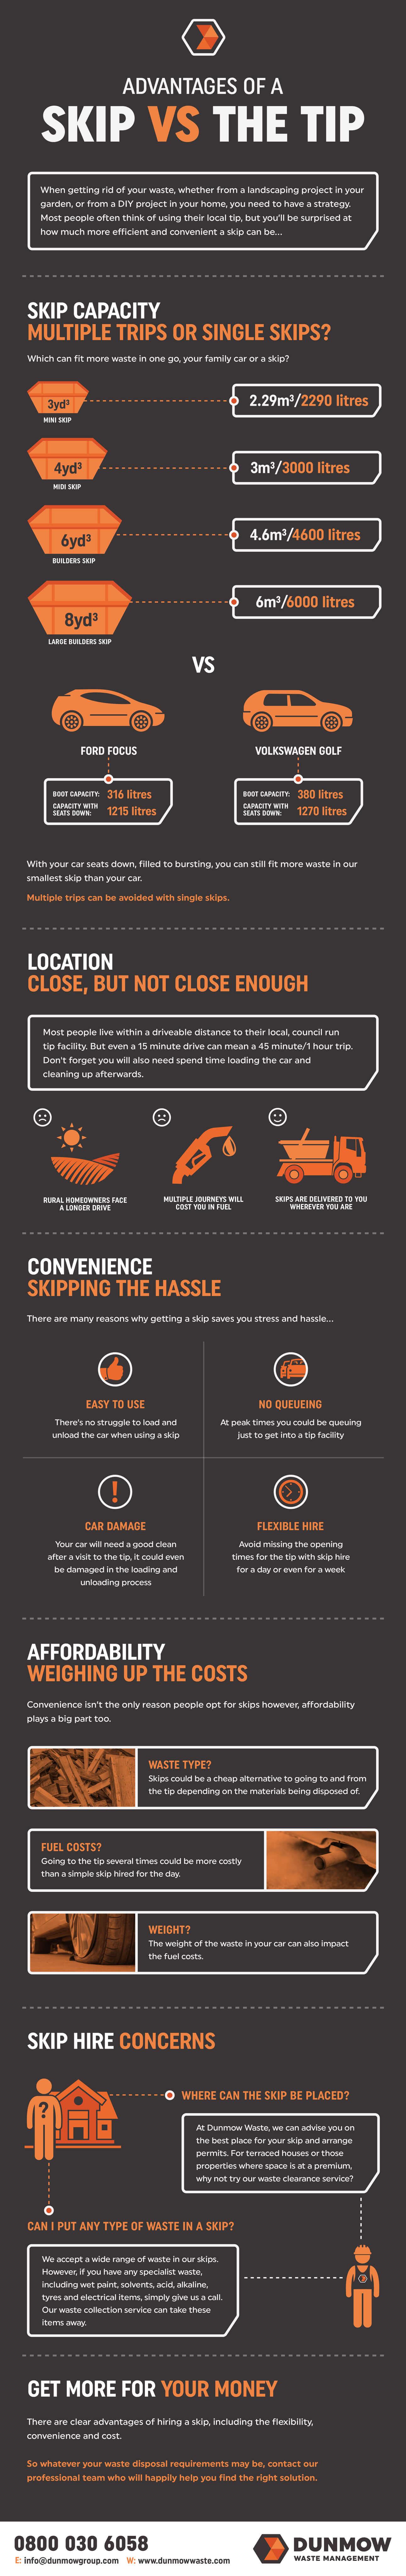 advantages-of-skip-vs-the-tip-infographic-plaza